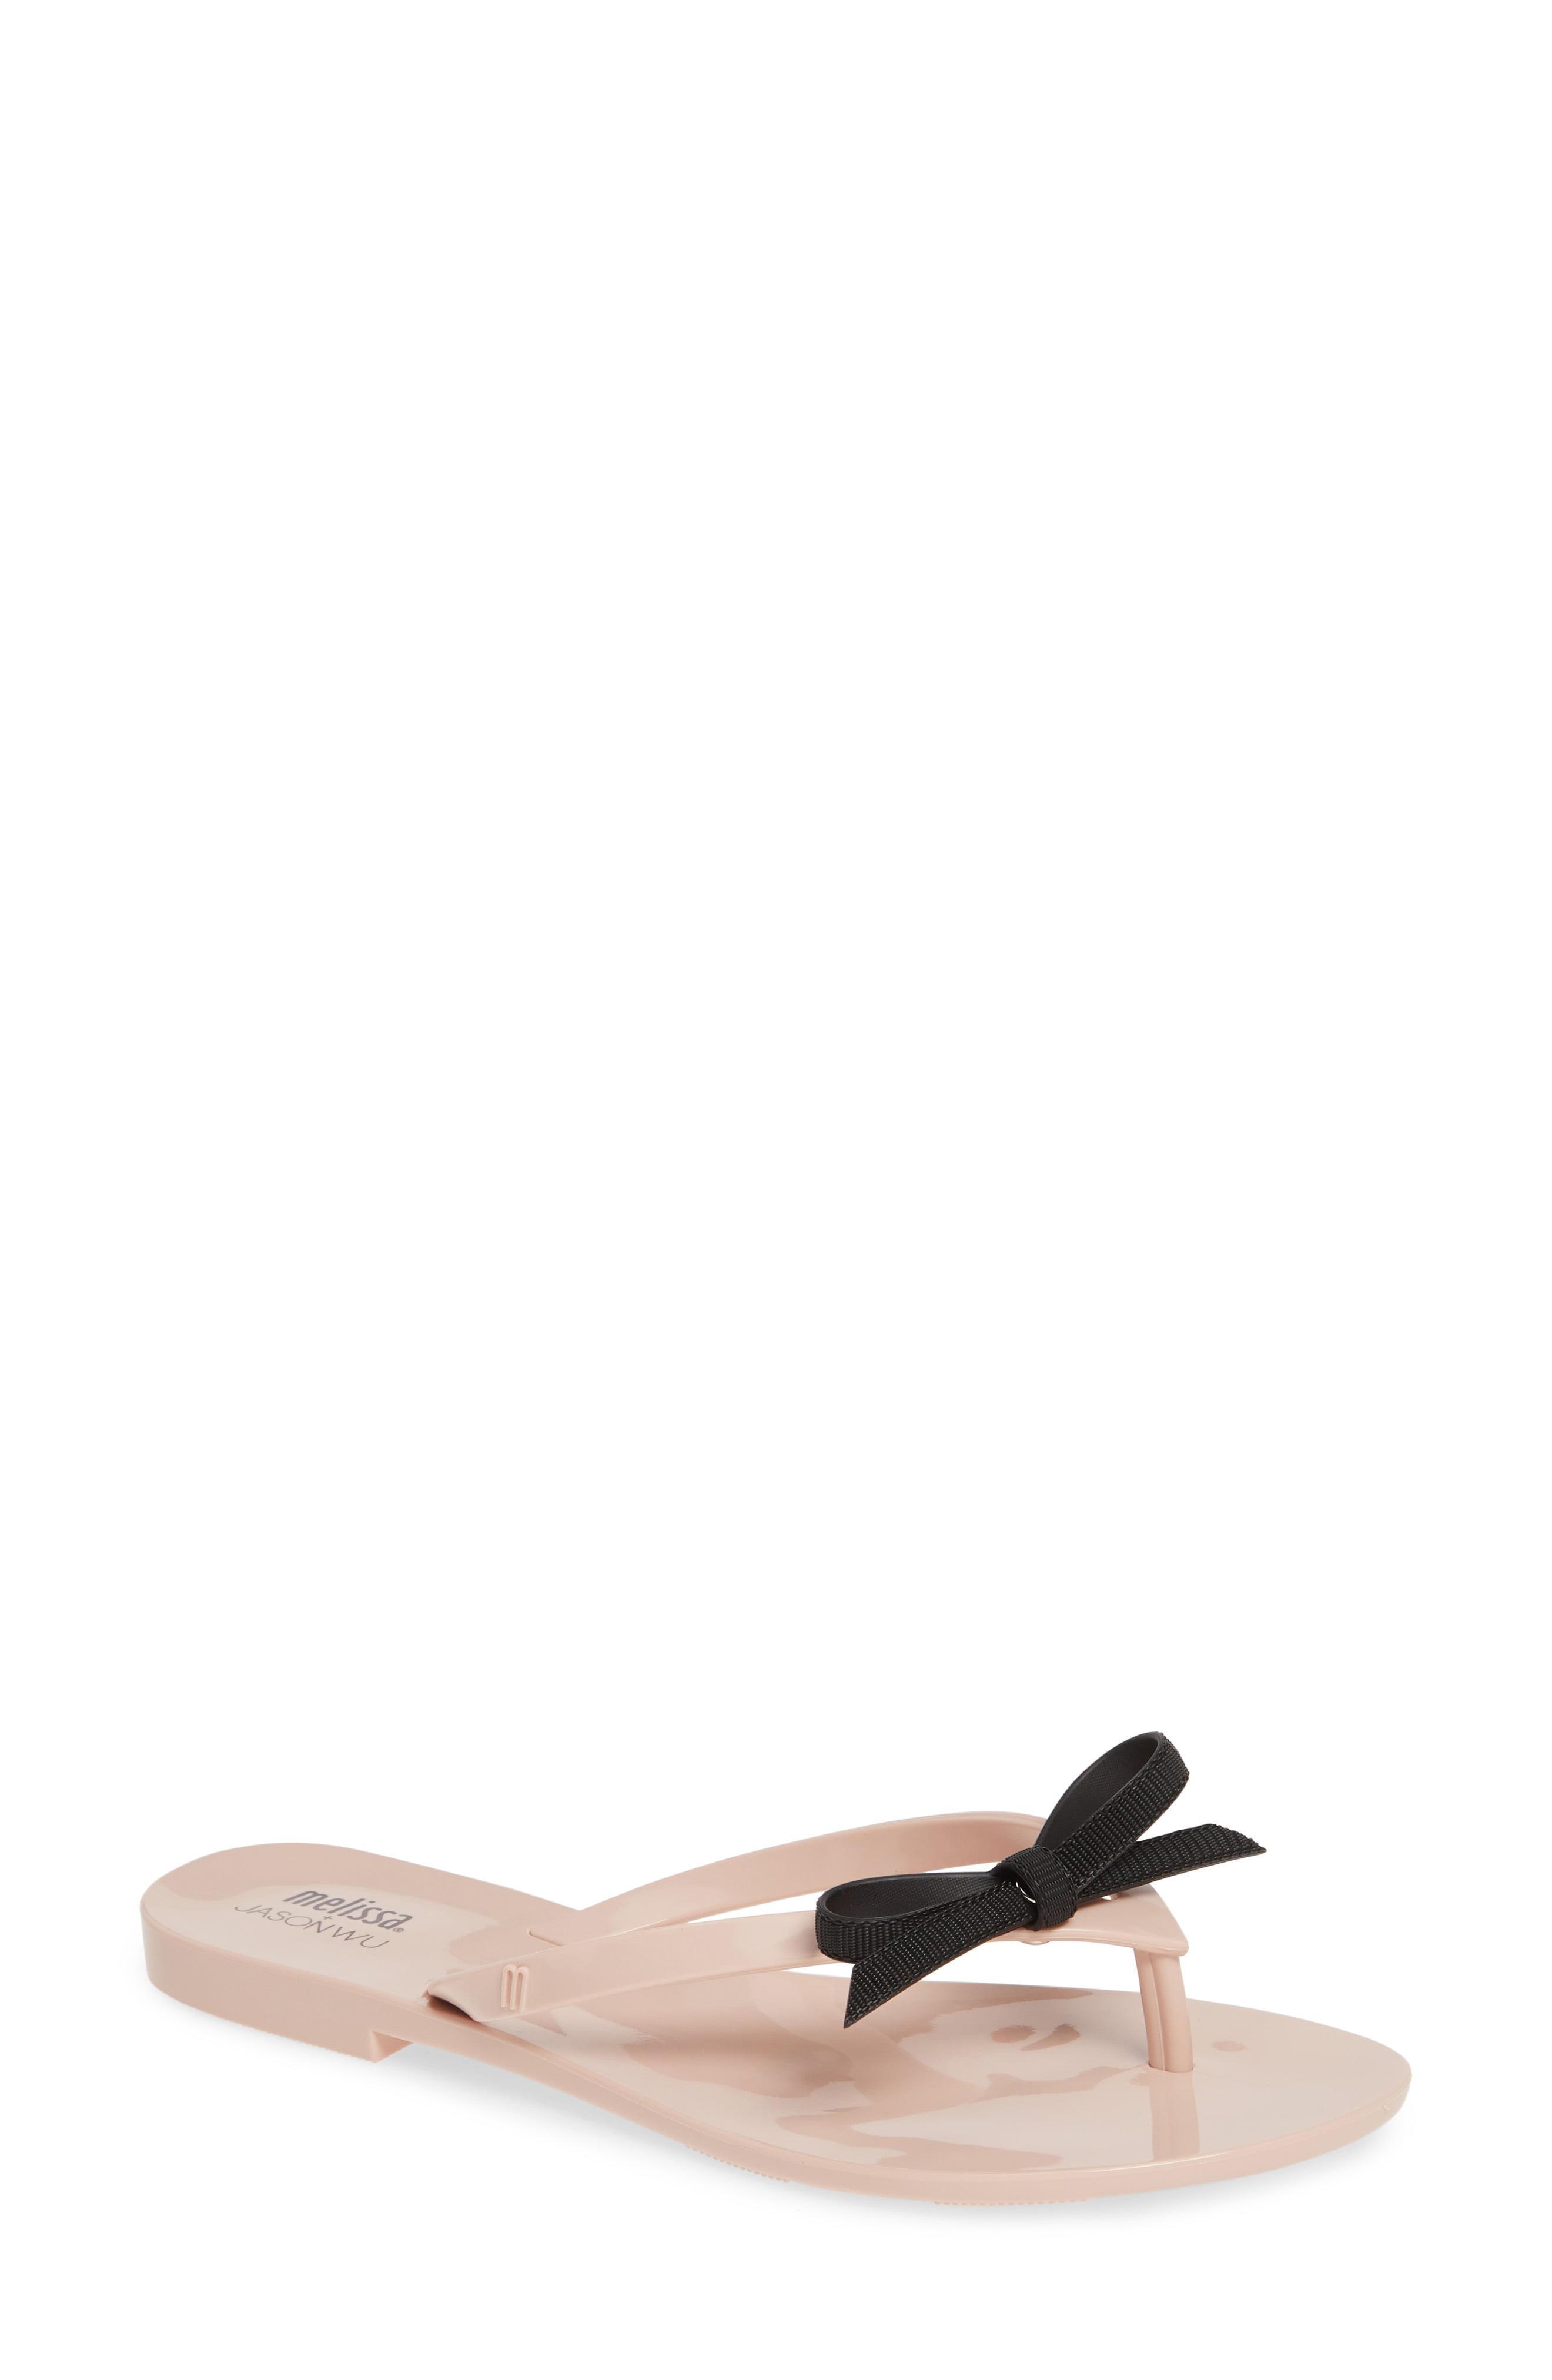 f9de6ccb49a Lyst - Melissa Harmonic Bow Jelly Flip Flop in Black